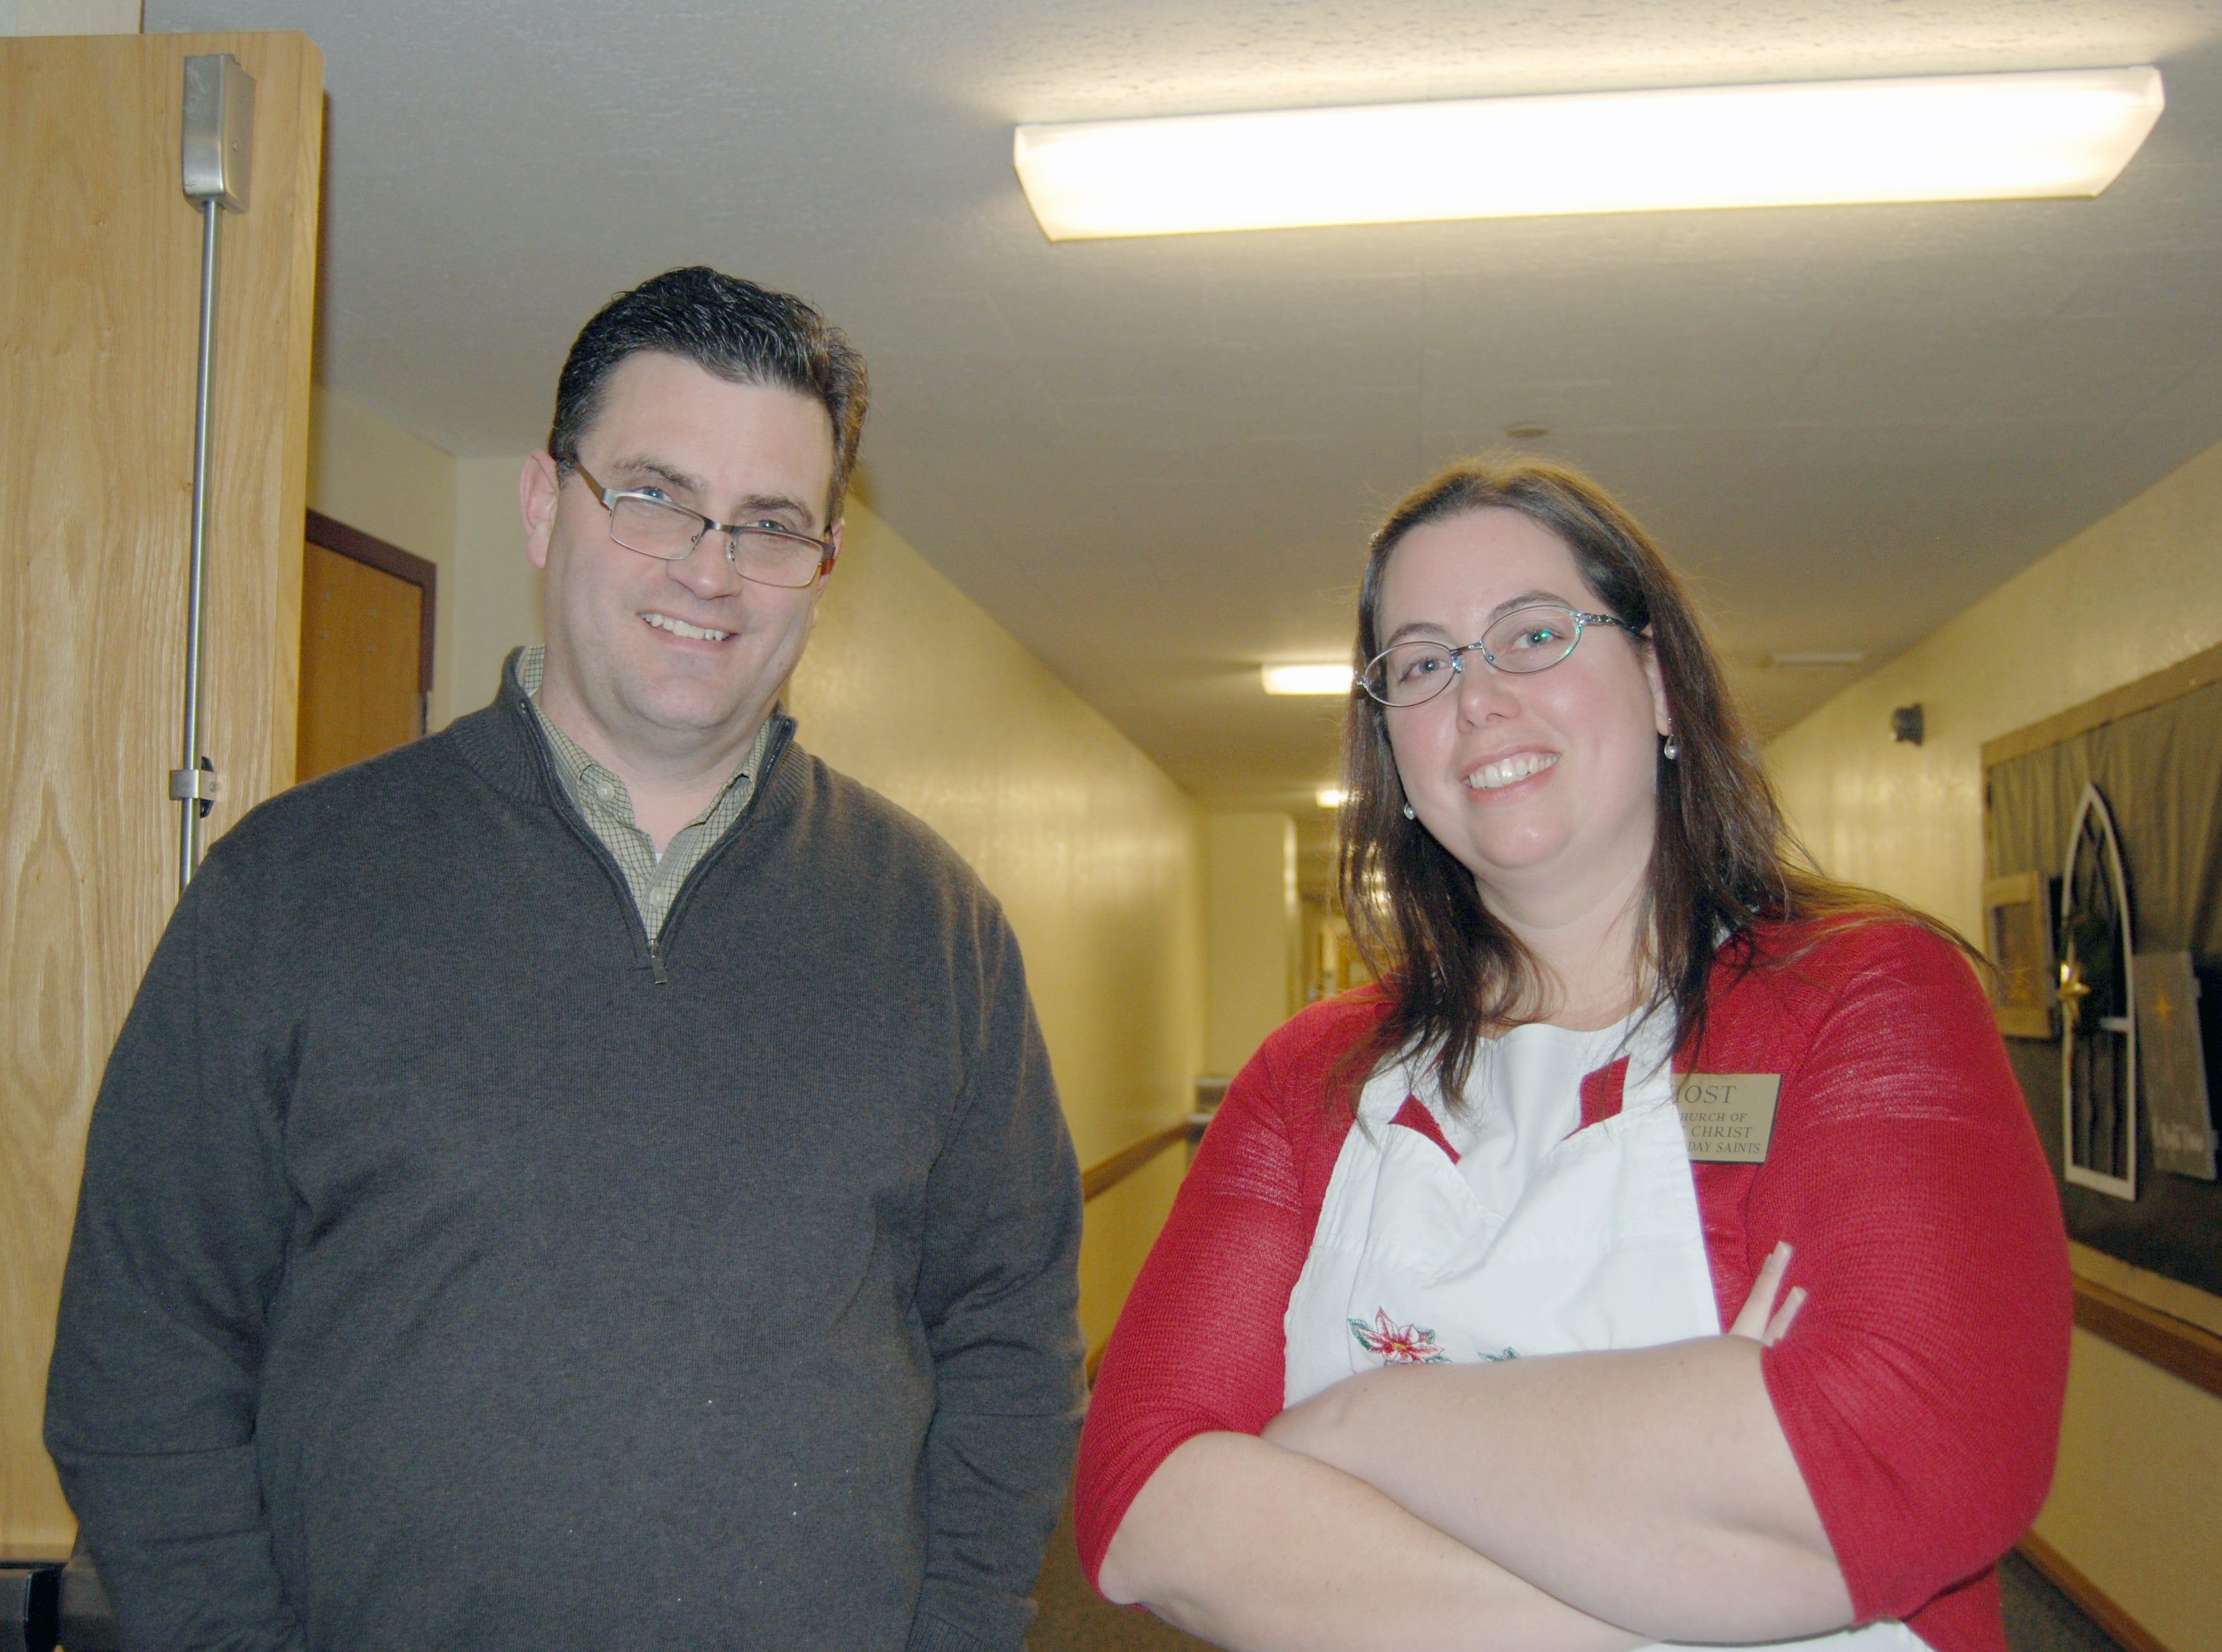 Scott Wallentine and Cari Maughan